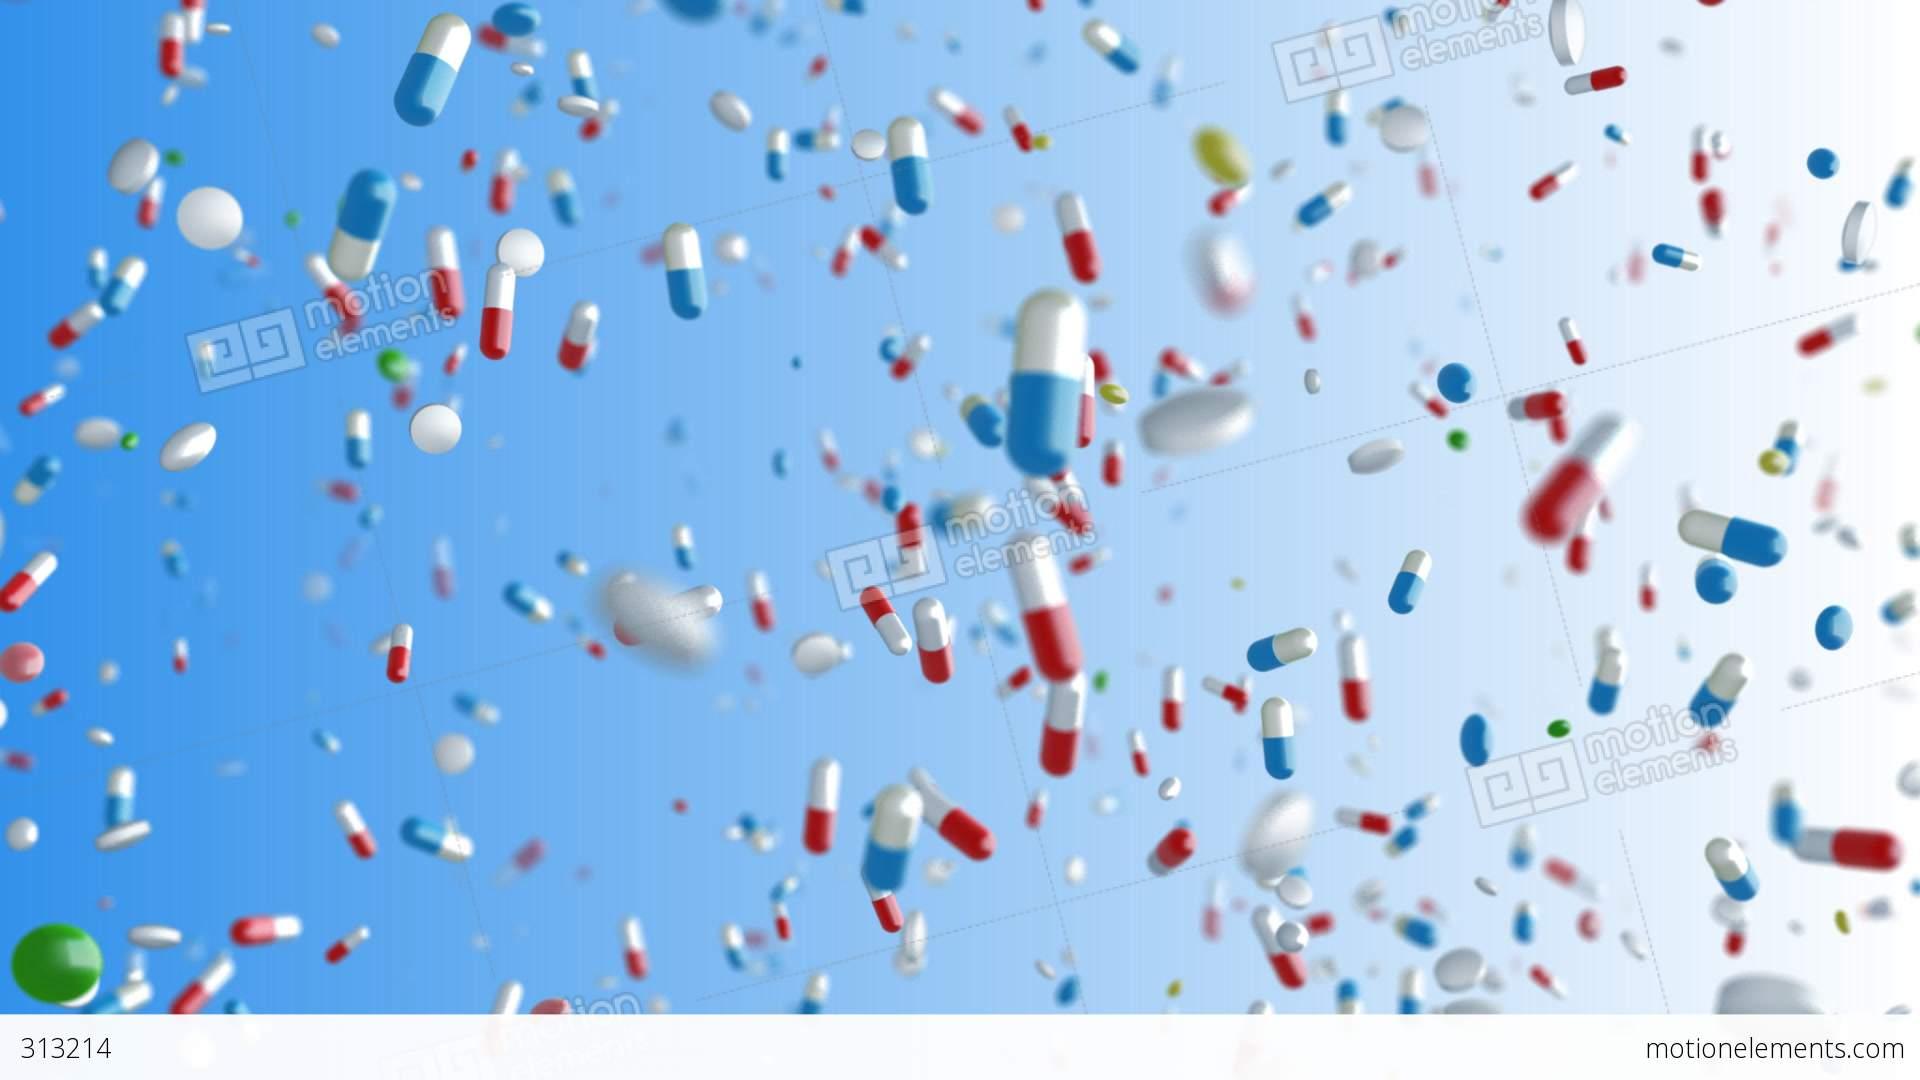 Medicine Drug 2bC Capsule Tablet Pills Stock Animation | 313214